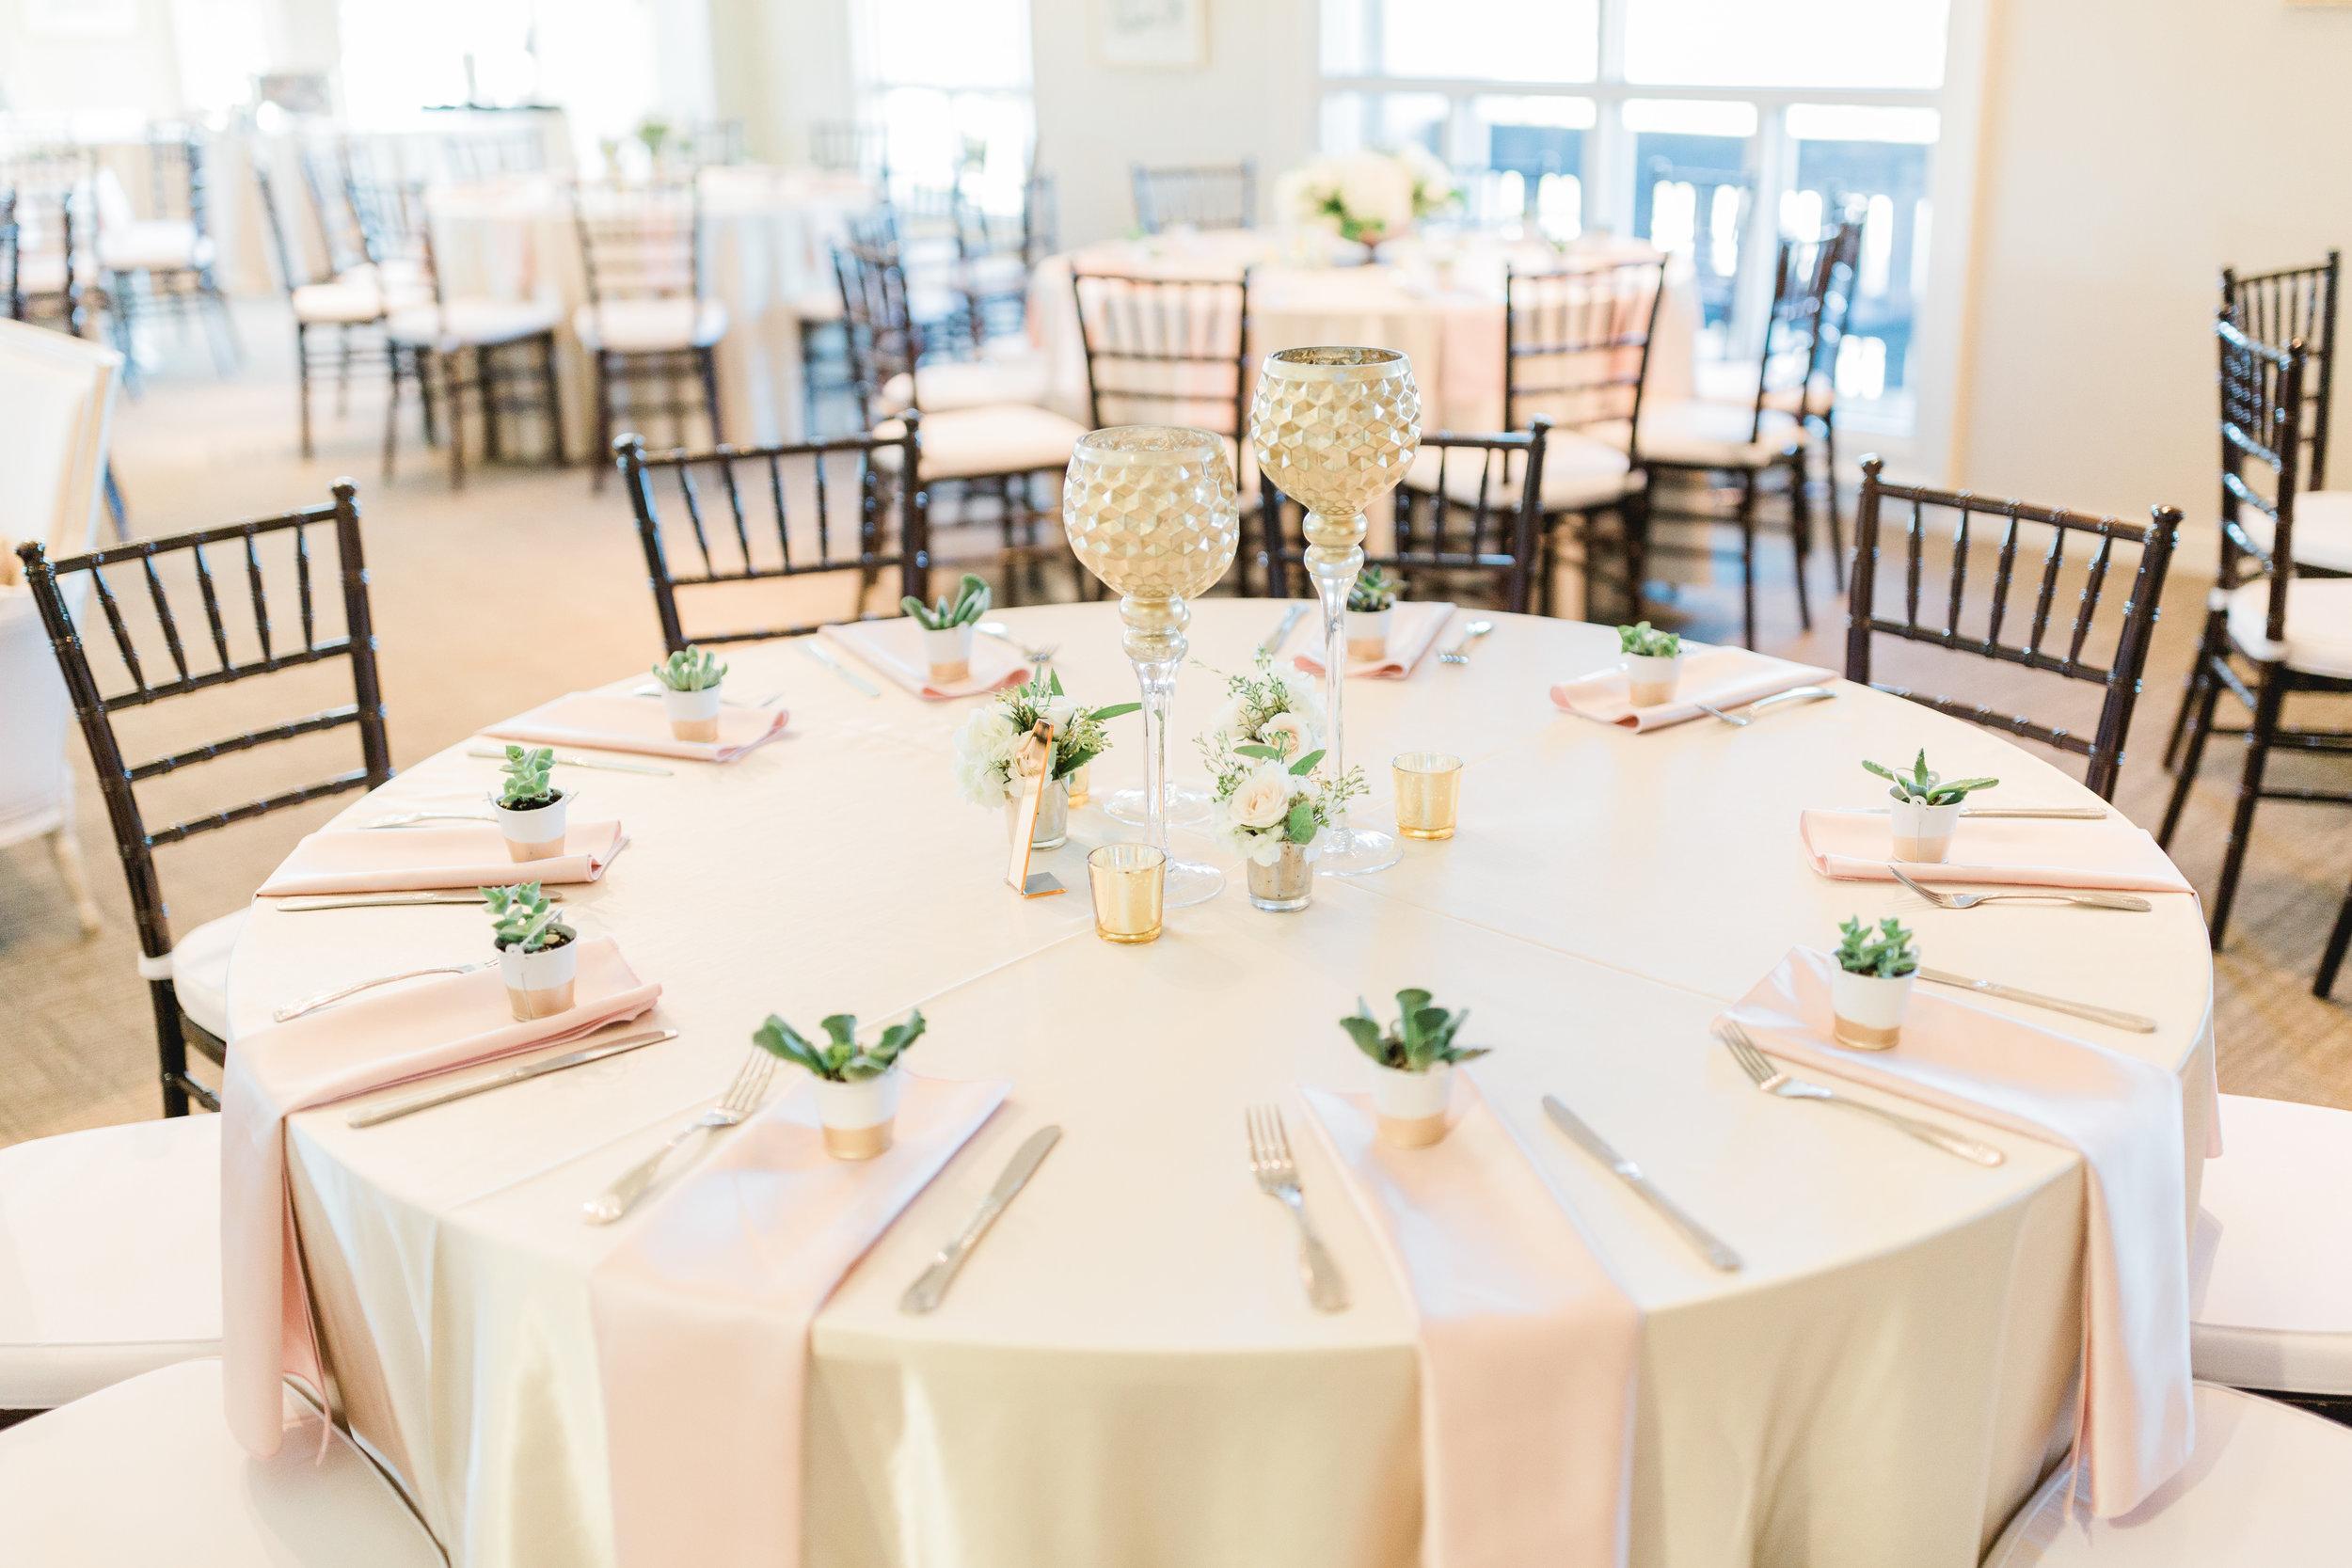 Mount Pleasant Wedding Venue | Snee Farm Country Club